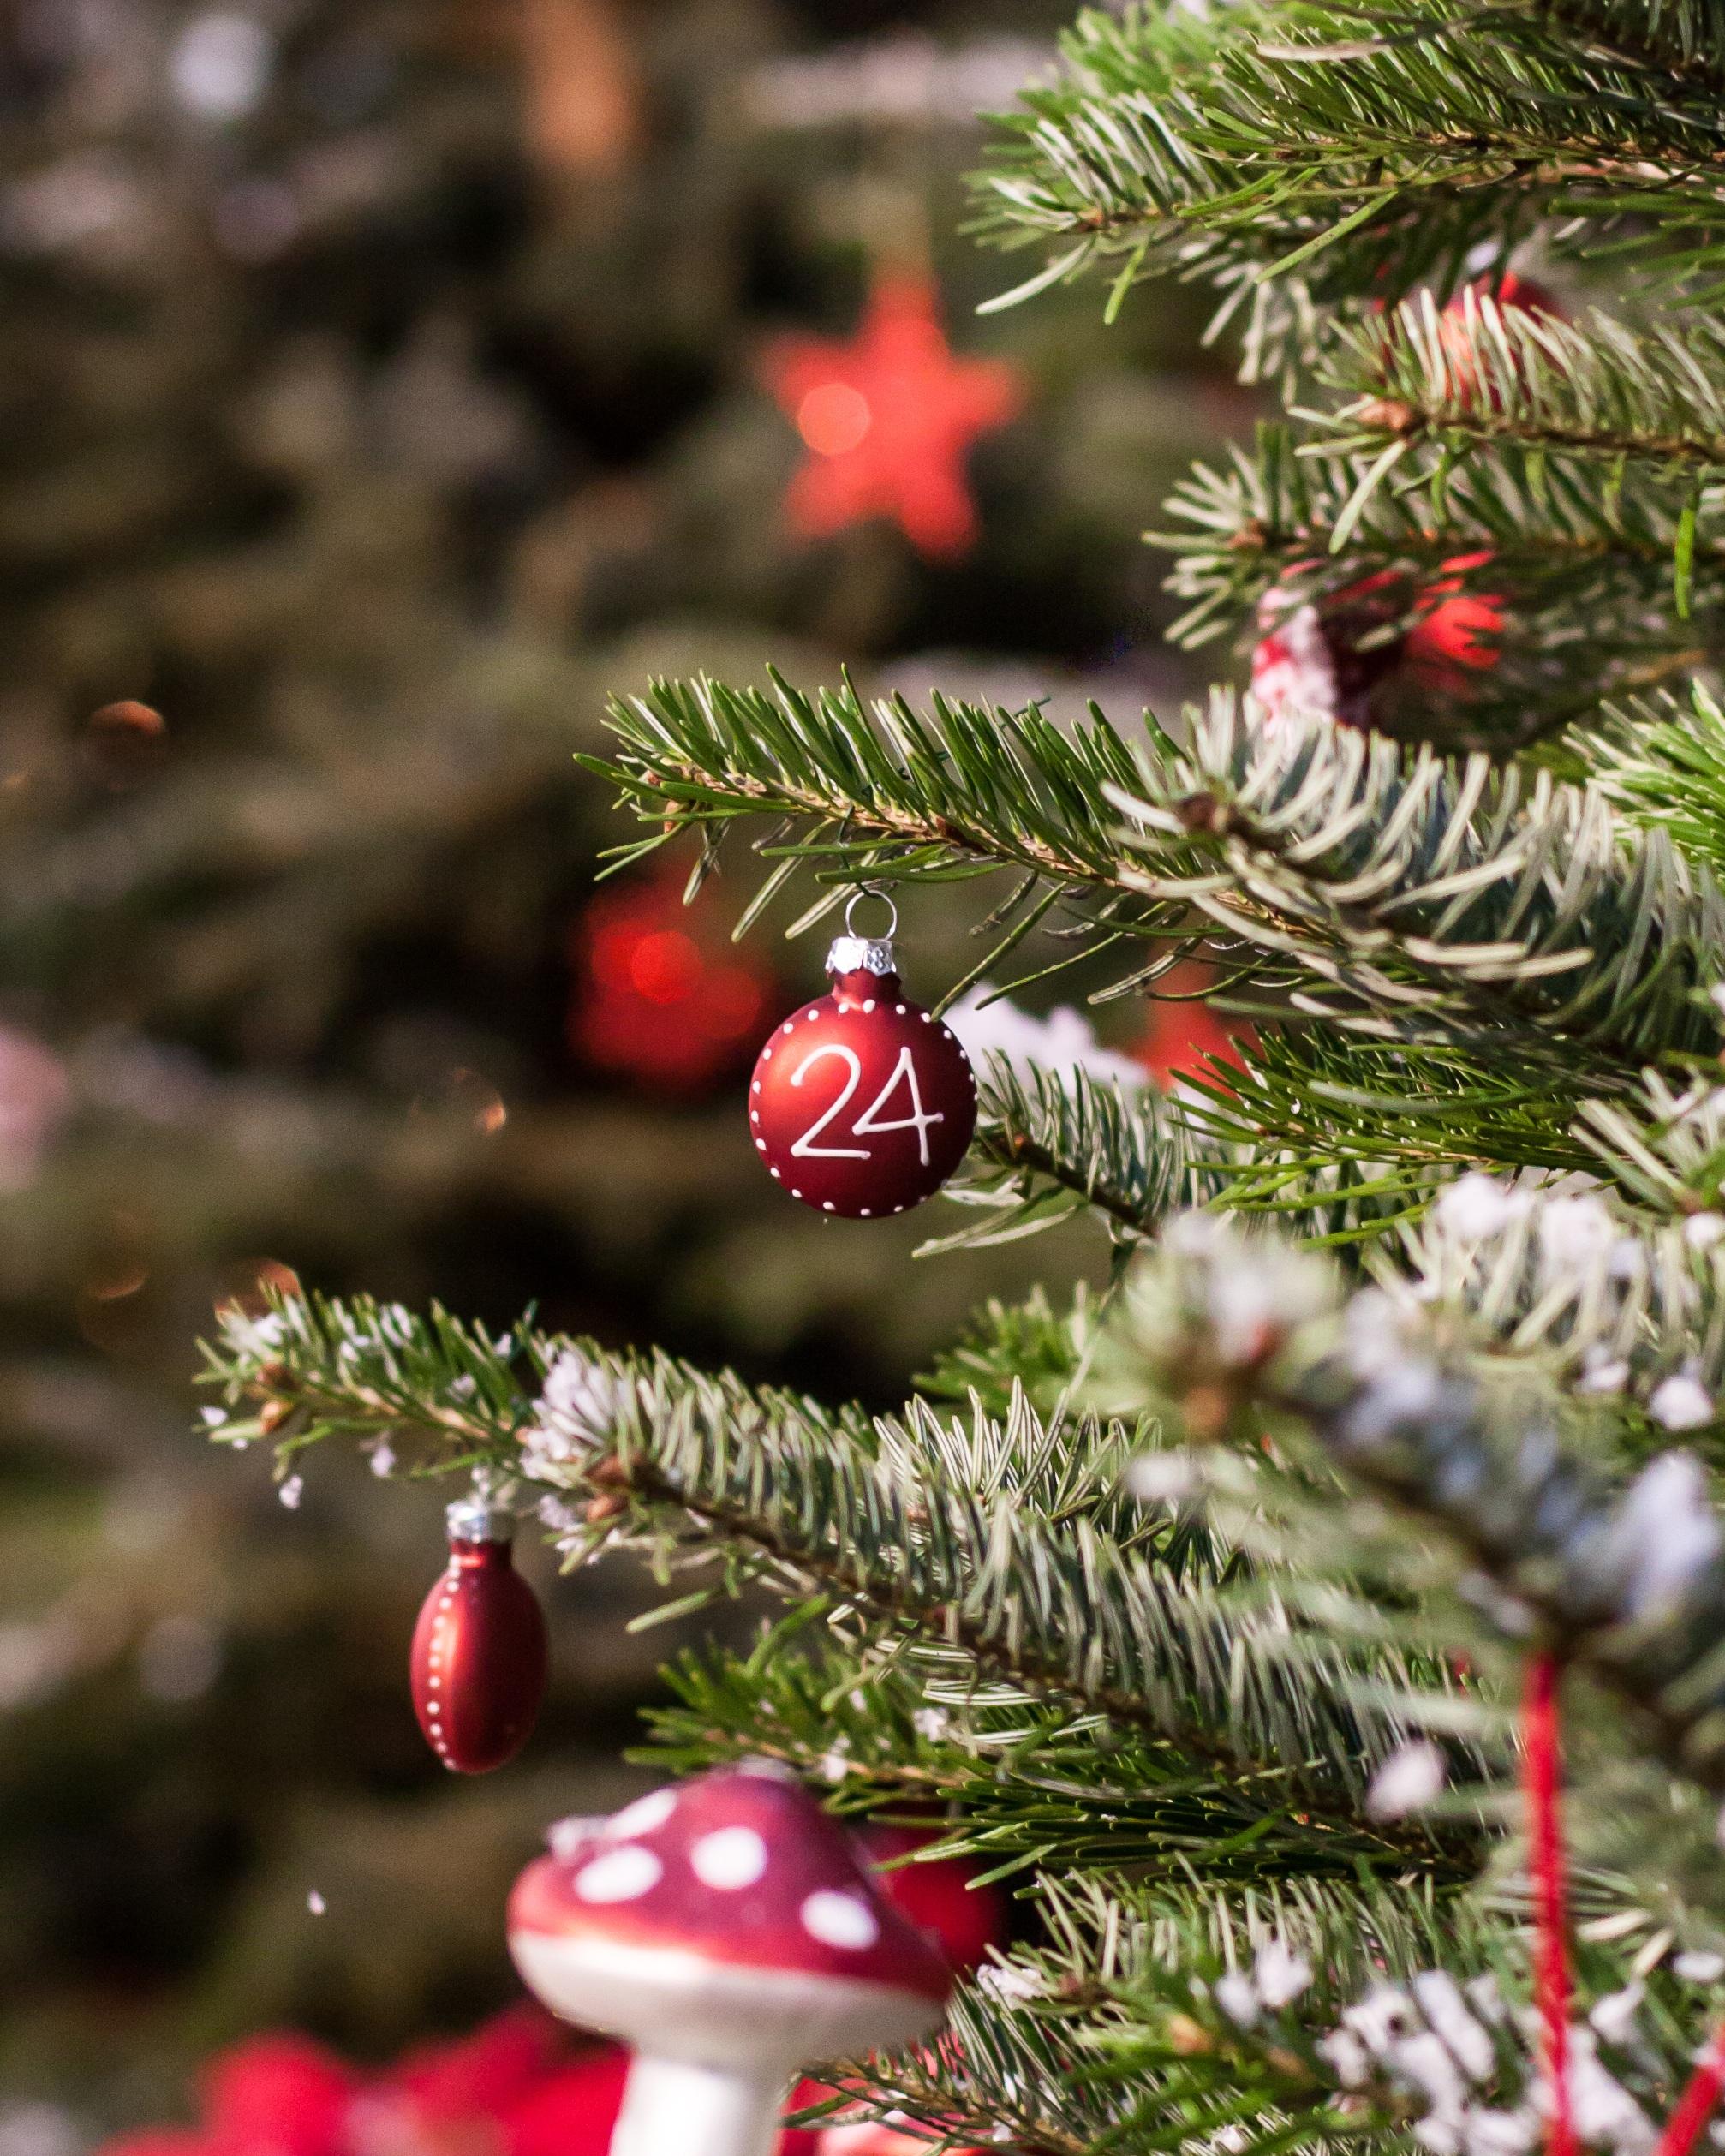 tree-branch-plant-red-evergreen-christmas-1061130-pxhere.com.jpg